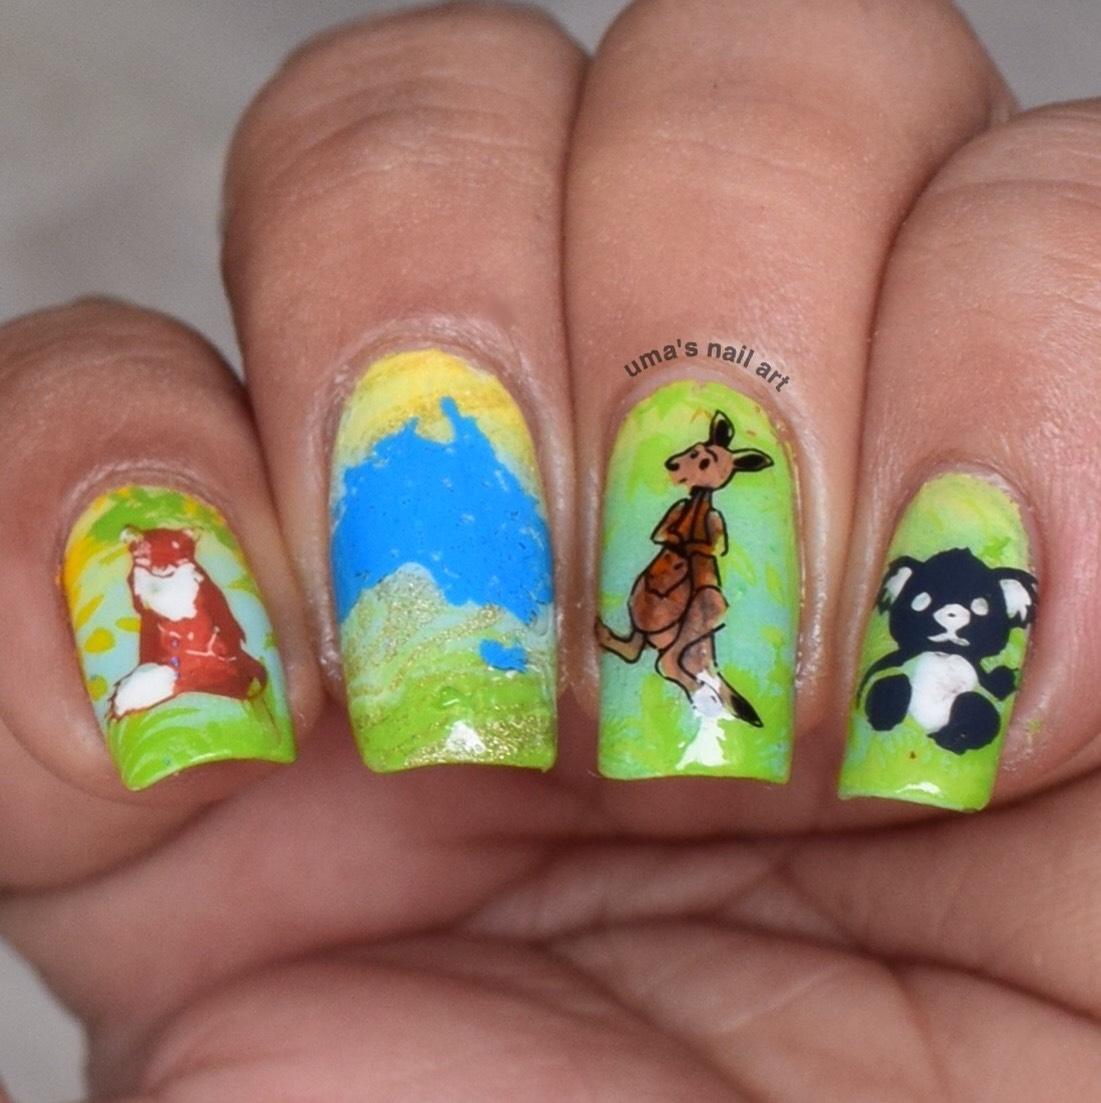 Uma\'s Nail Art: The Digital Dozen - 5 Days 5 Continents : Day 3